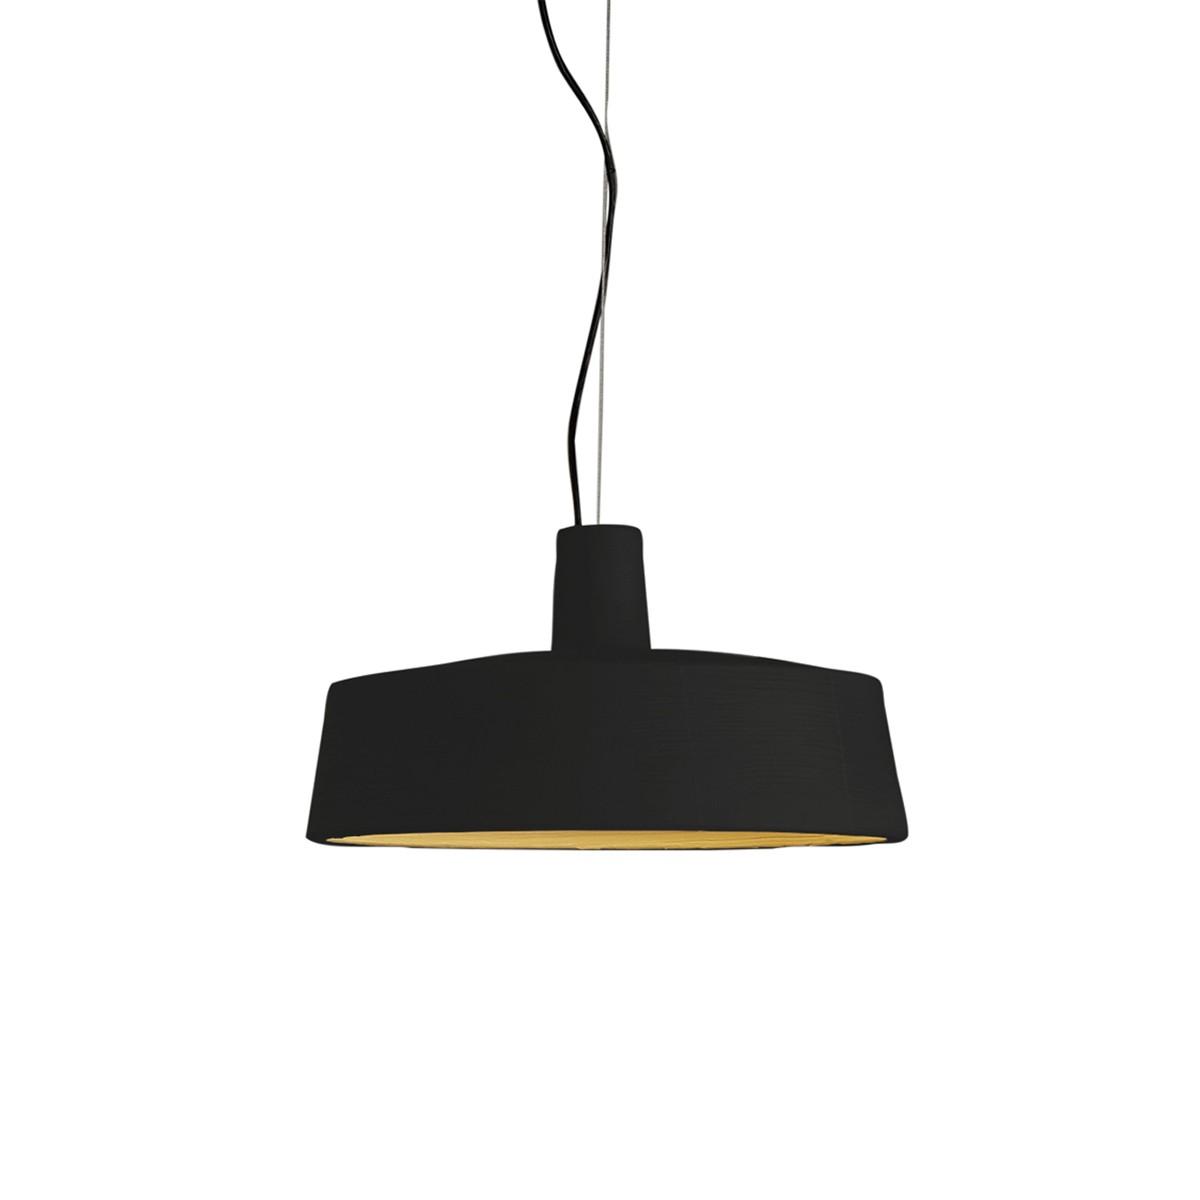 Marset Soho 57 LED Pendelleuchte, schwarz